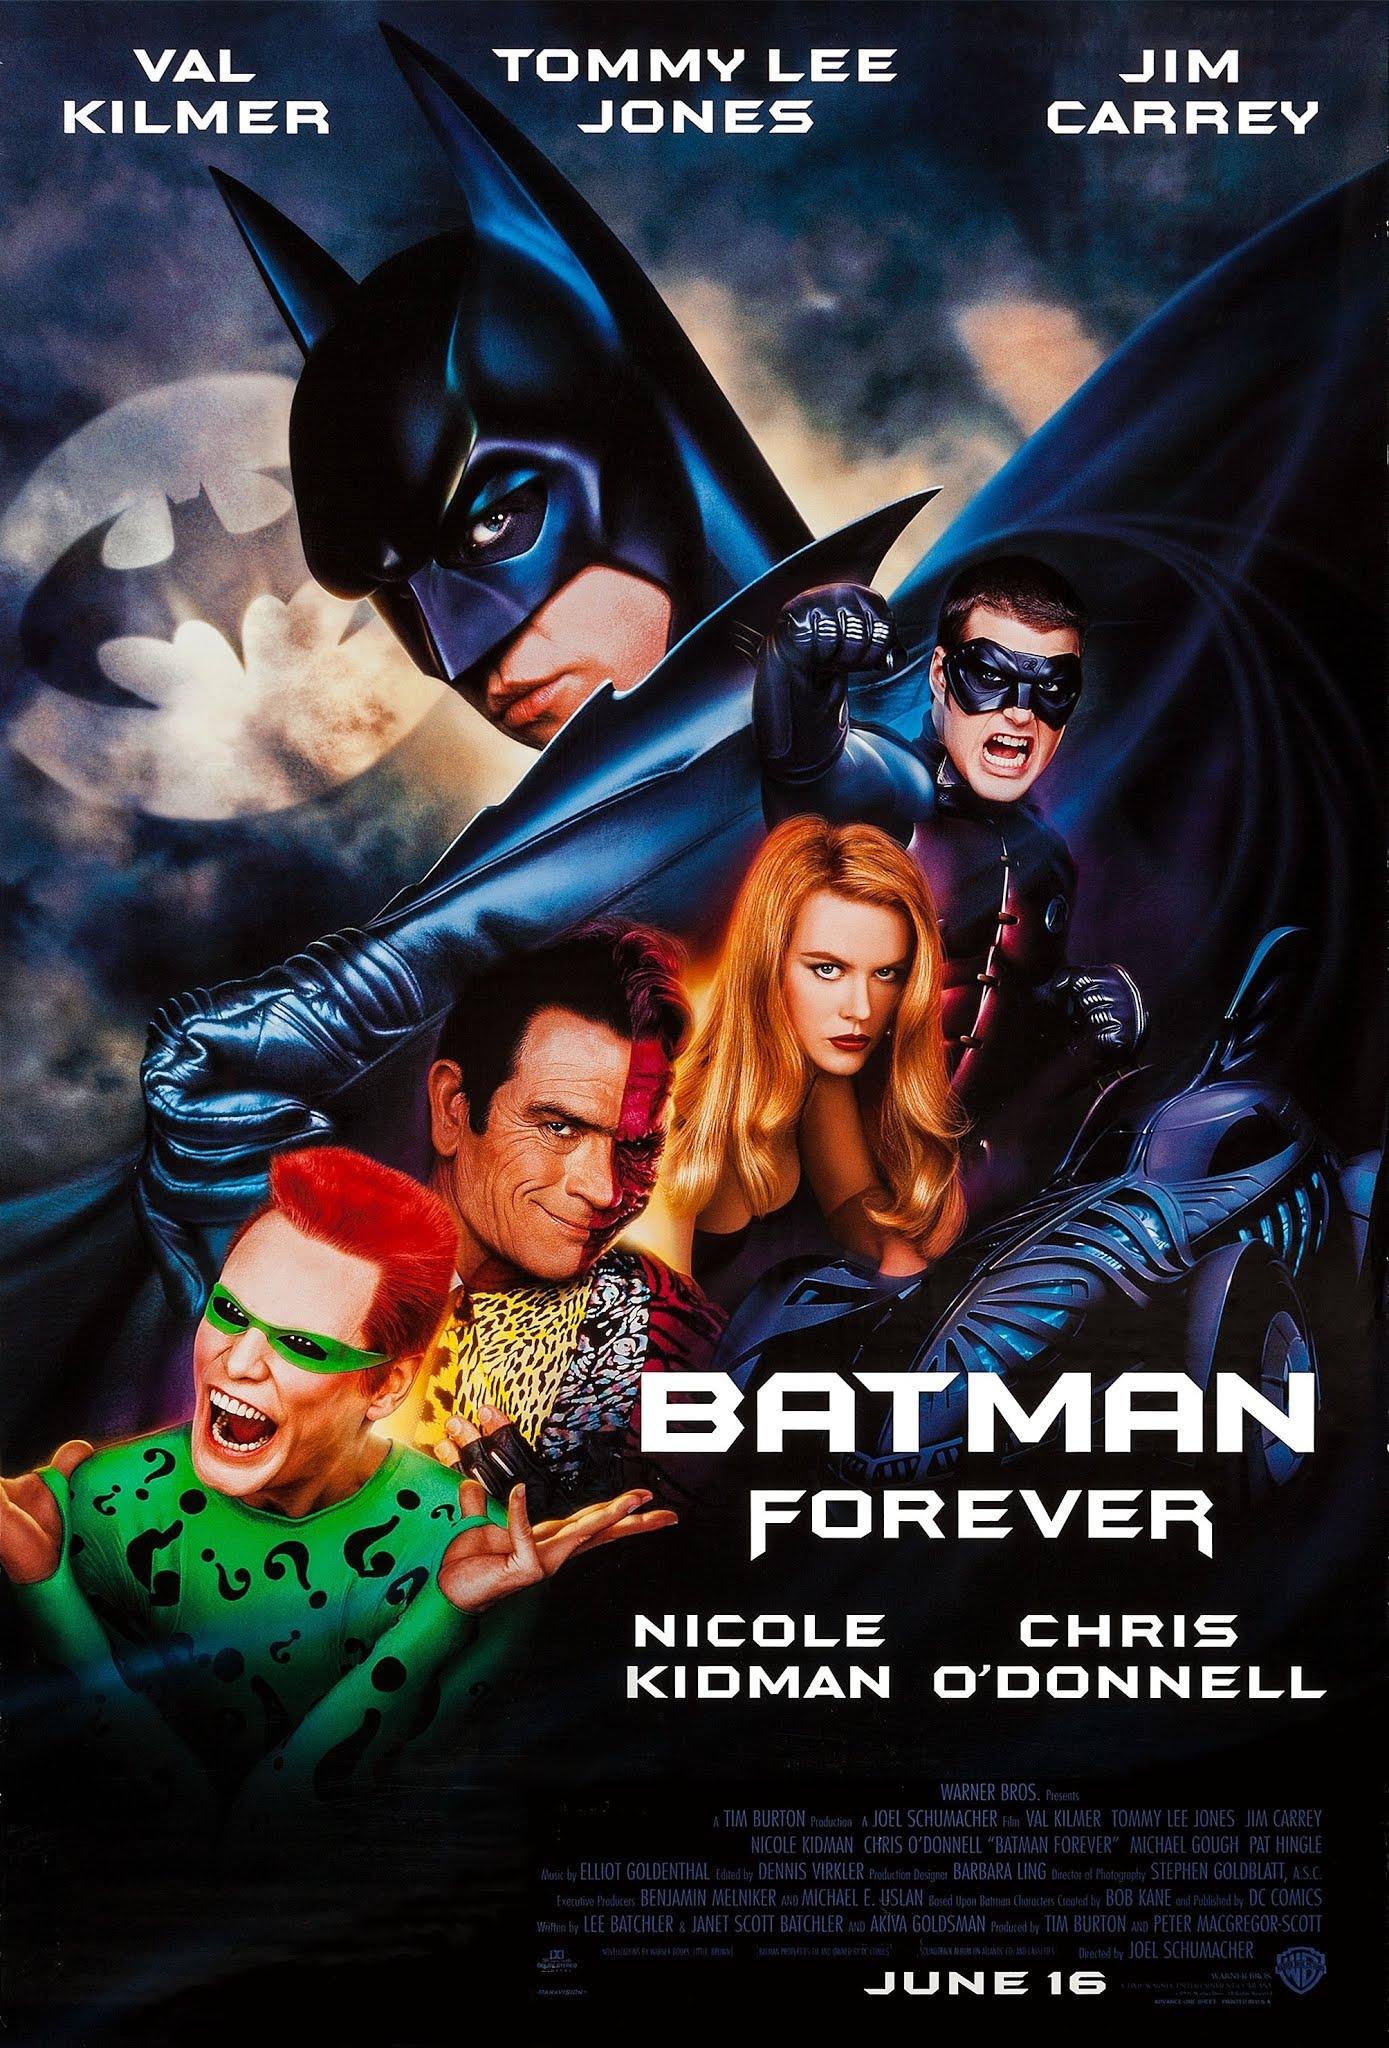 batman forever film recenzja val kilmer joel schumacher tommy lee jones jim carrey